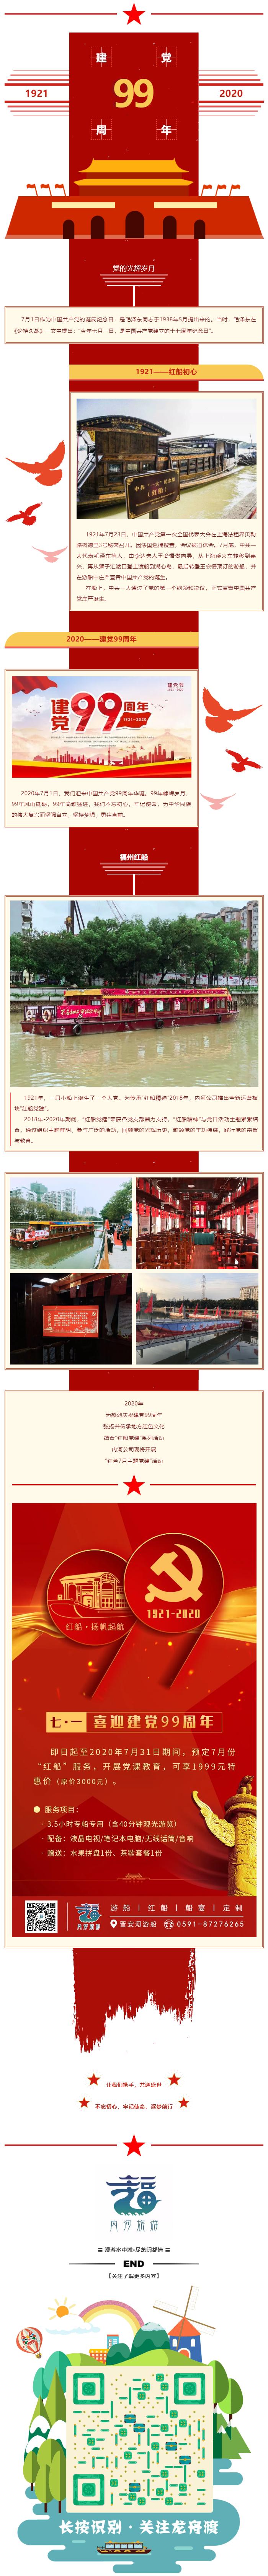 喜迎建党99周年 _ 福州红船,扬帆起航.png